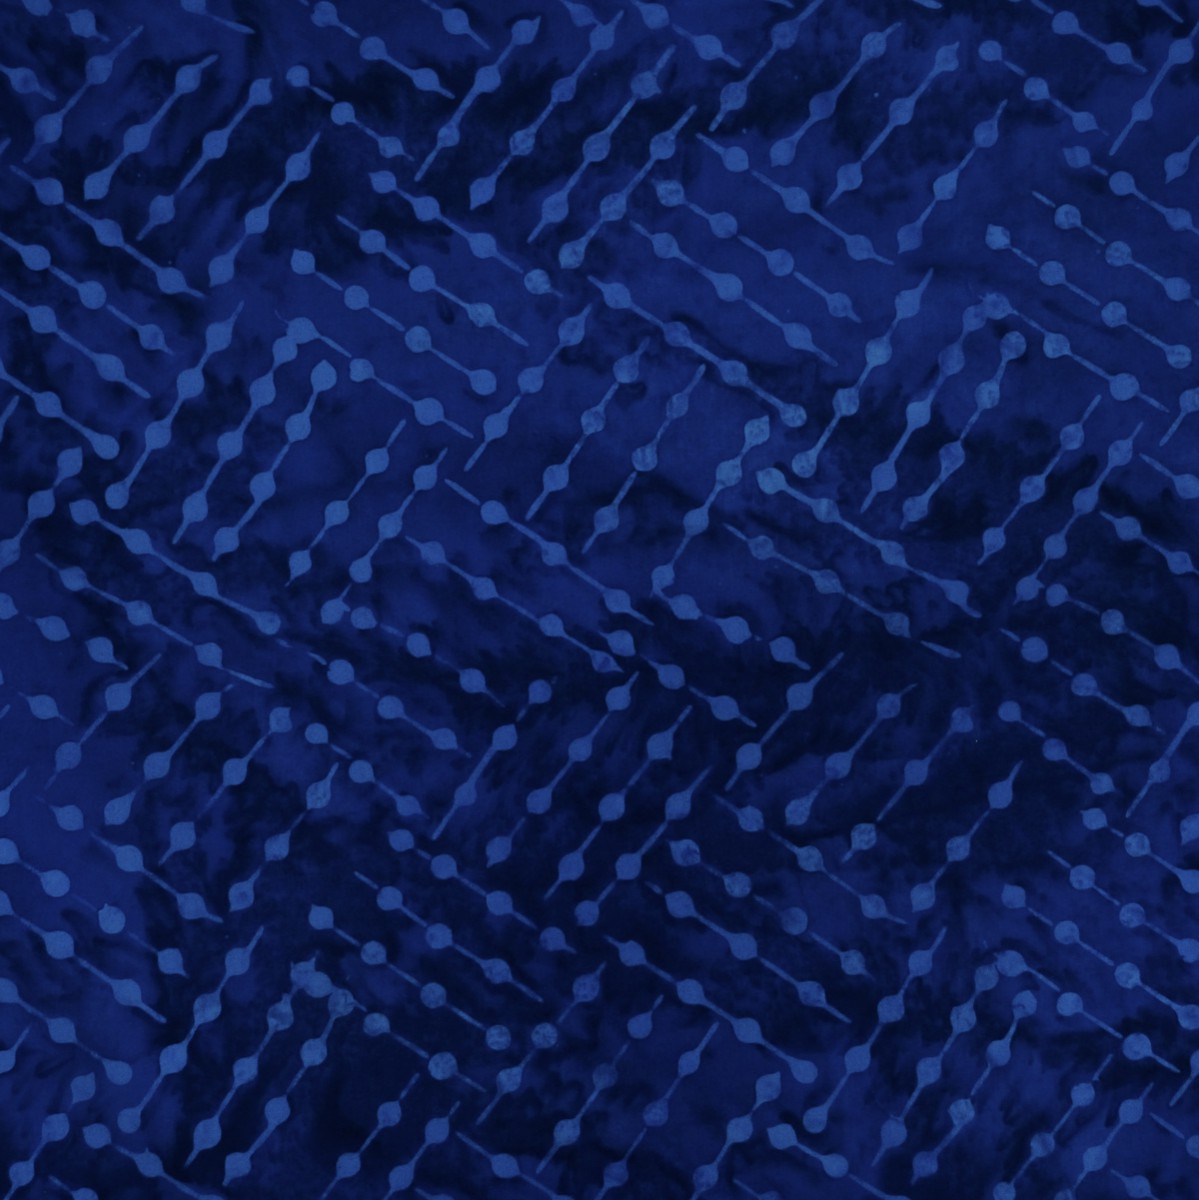 MG-6-9211 Glamour Blue (1)